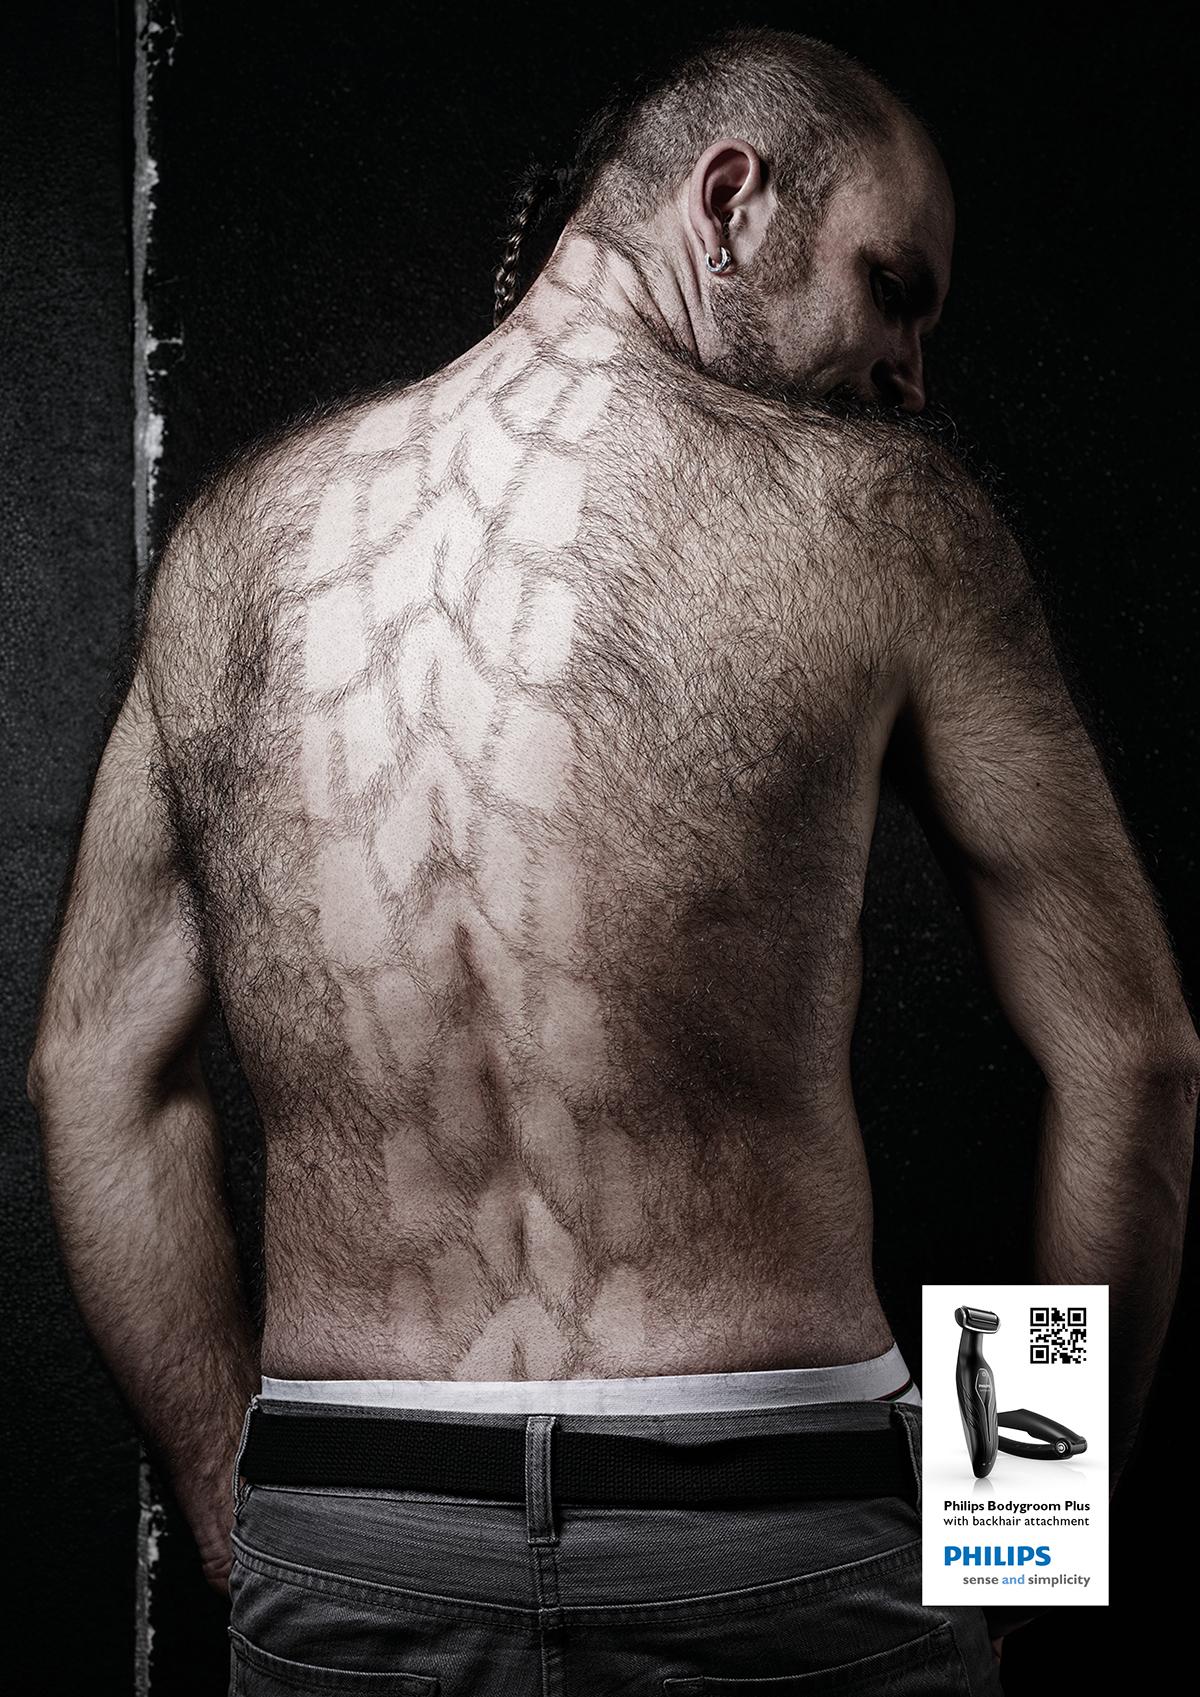 Adobe Portfolio,backhair,hairstyling,hairstyle,bodygroom,people,men,shave,shaver